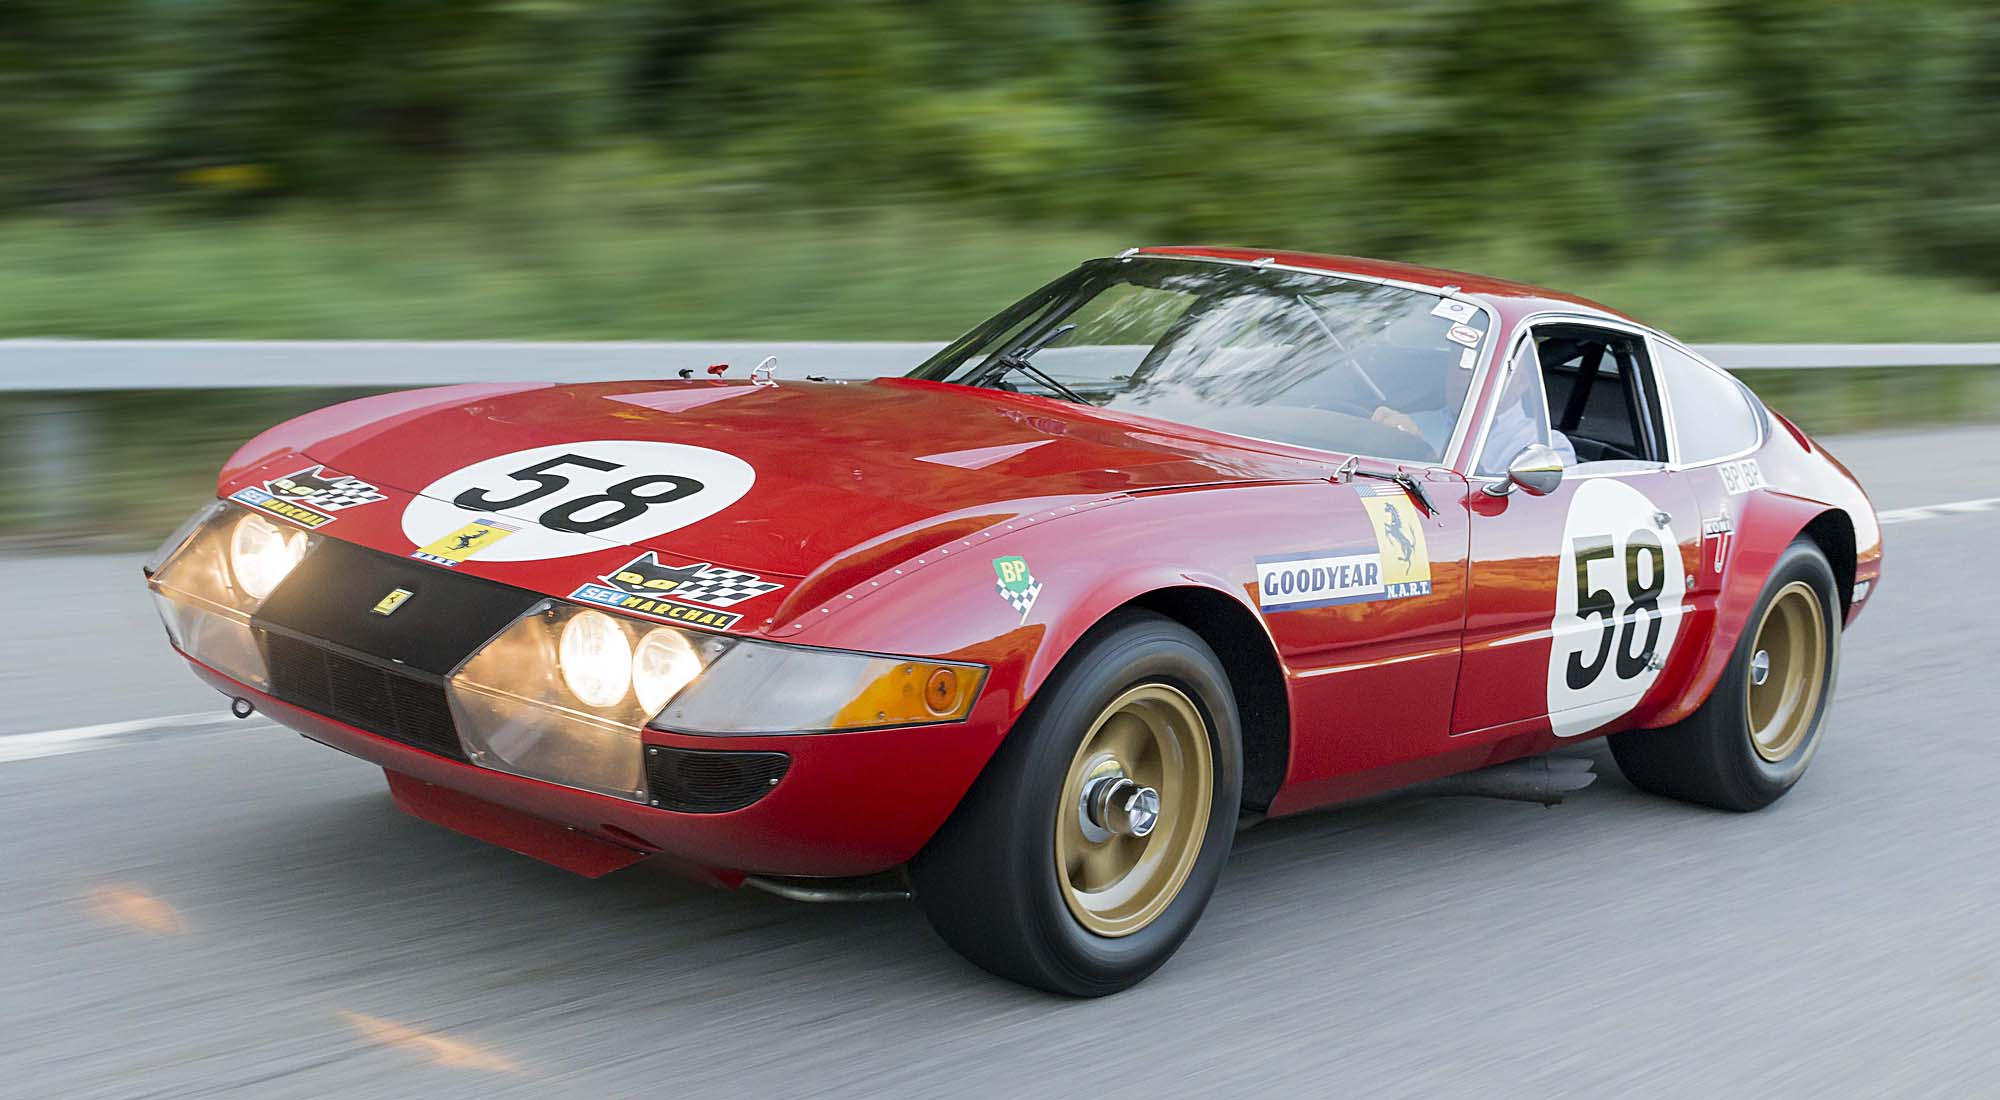 Used Car Auctions >> 1969 Ferrari 365 GTB/4 'Daytona' - N.A.R.T. COMPETIZIONE | Classic Driver Market